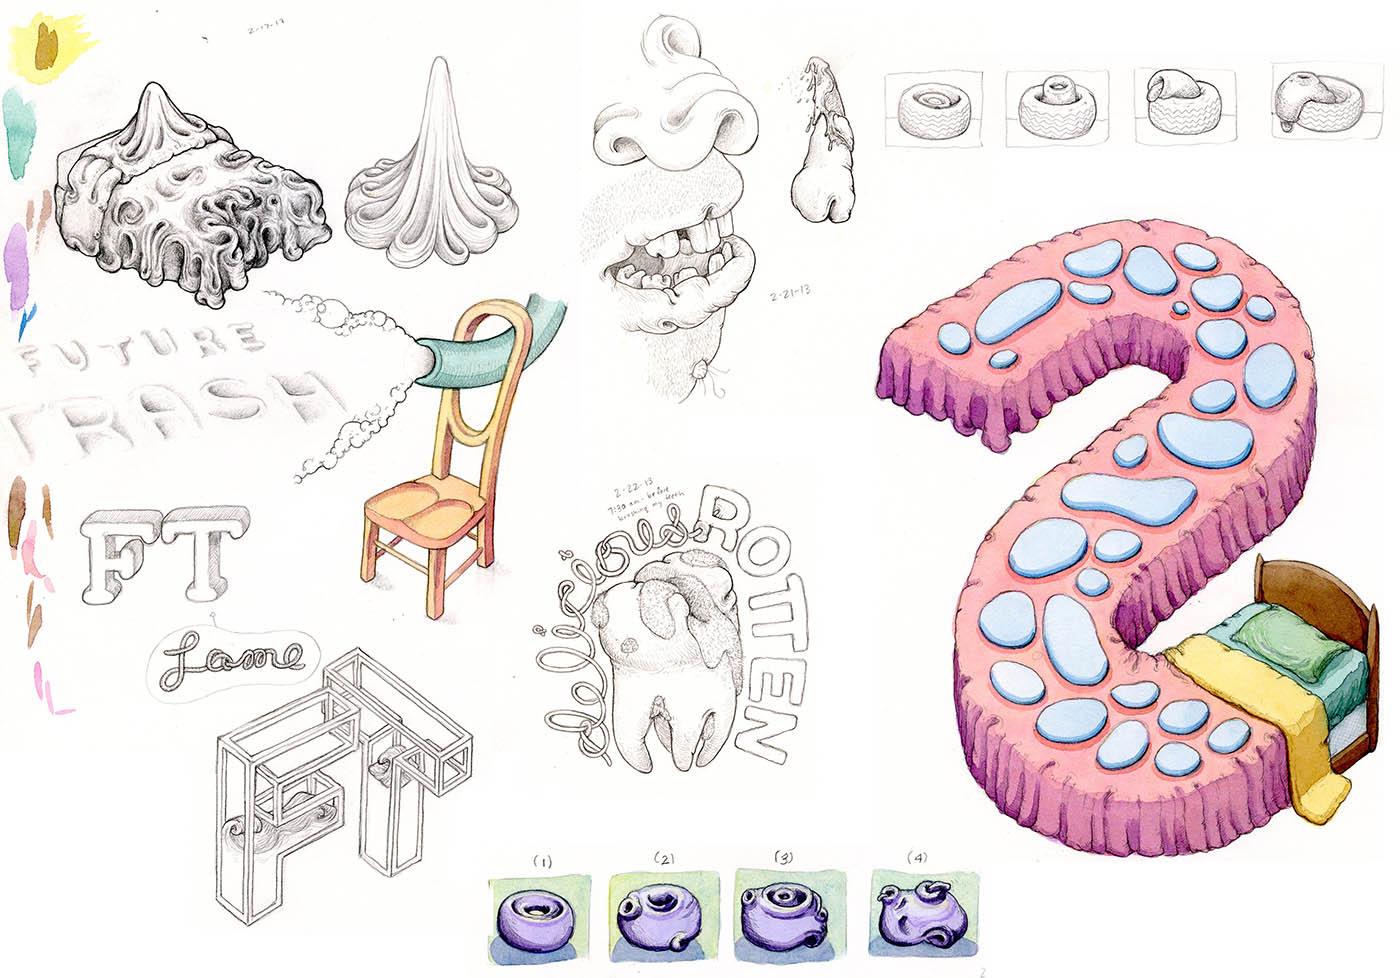 fla_sketches.jpg